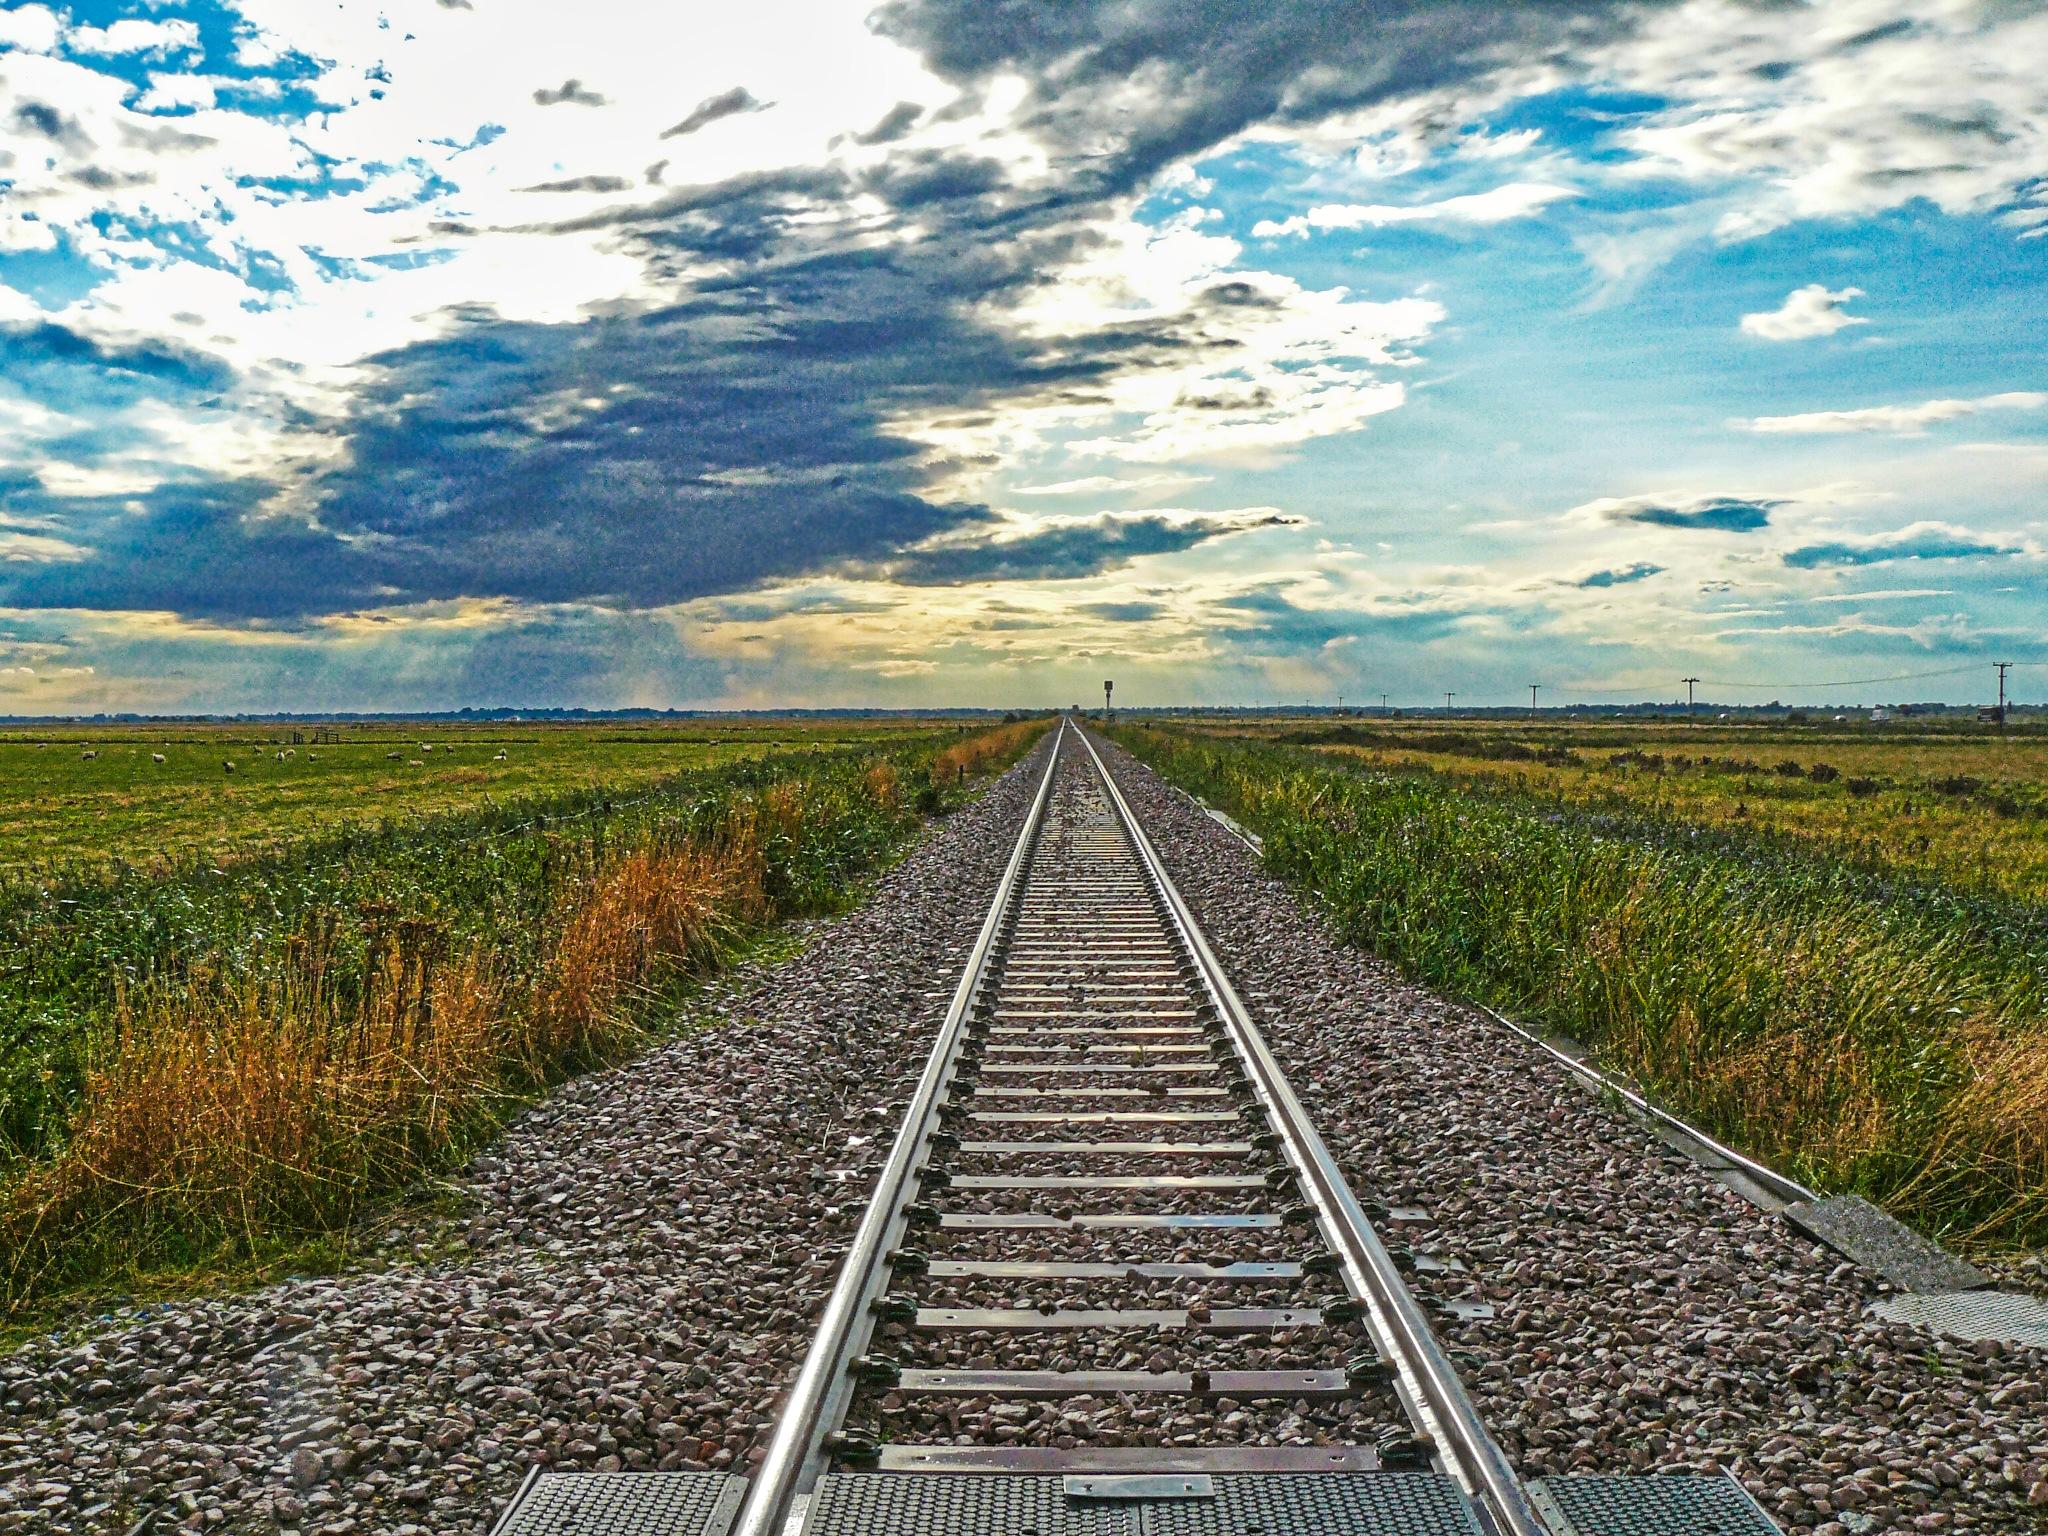 Distant shower by rail by AJ Yakstrangler Andy Jamieson